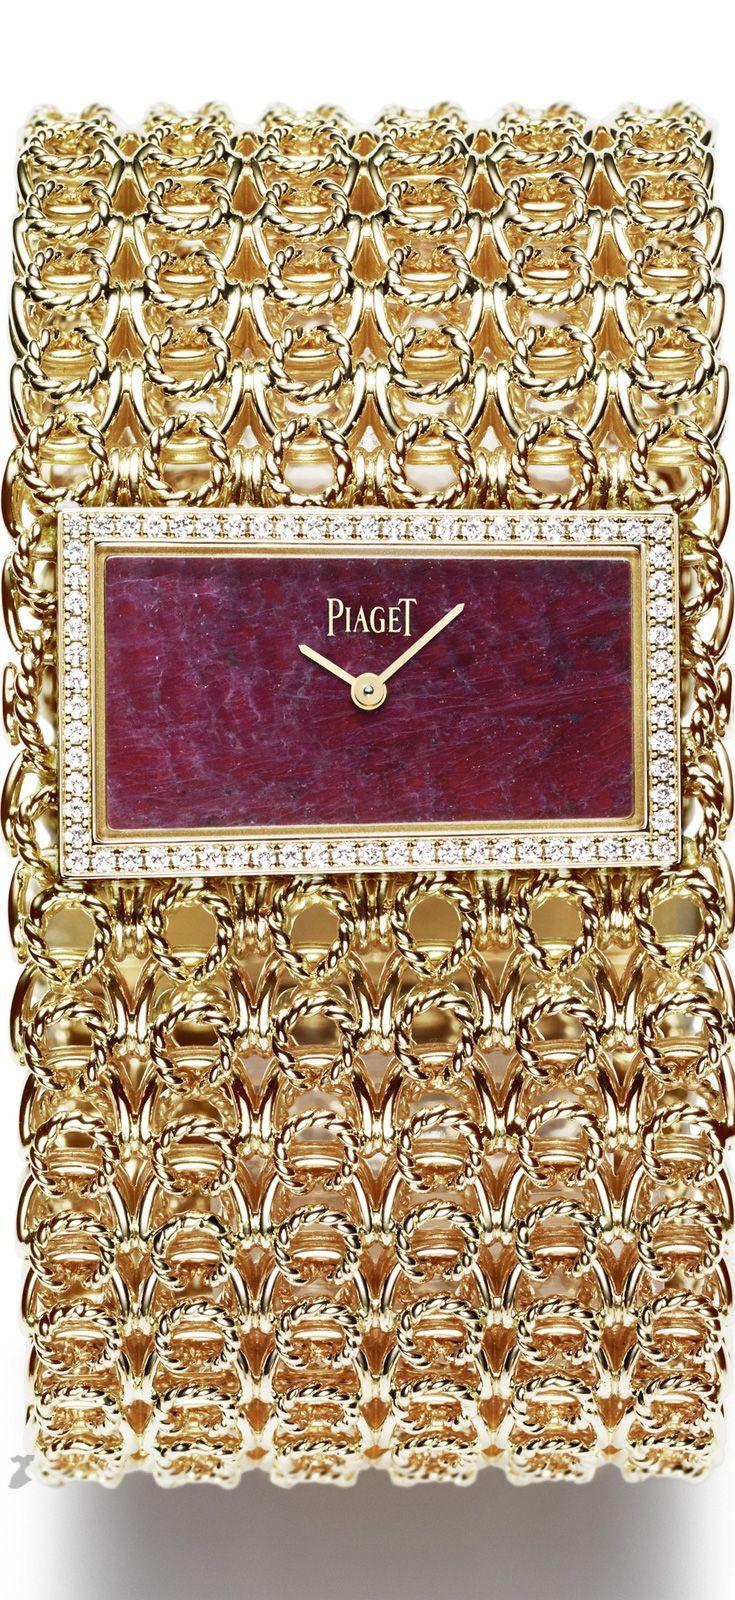 Rosamaria G Frangini | High Whatch Jewellery | #Piaget Ruby & Diamonds Watch